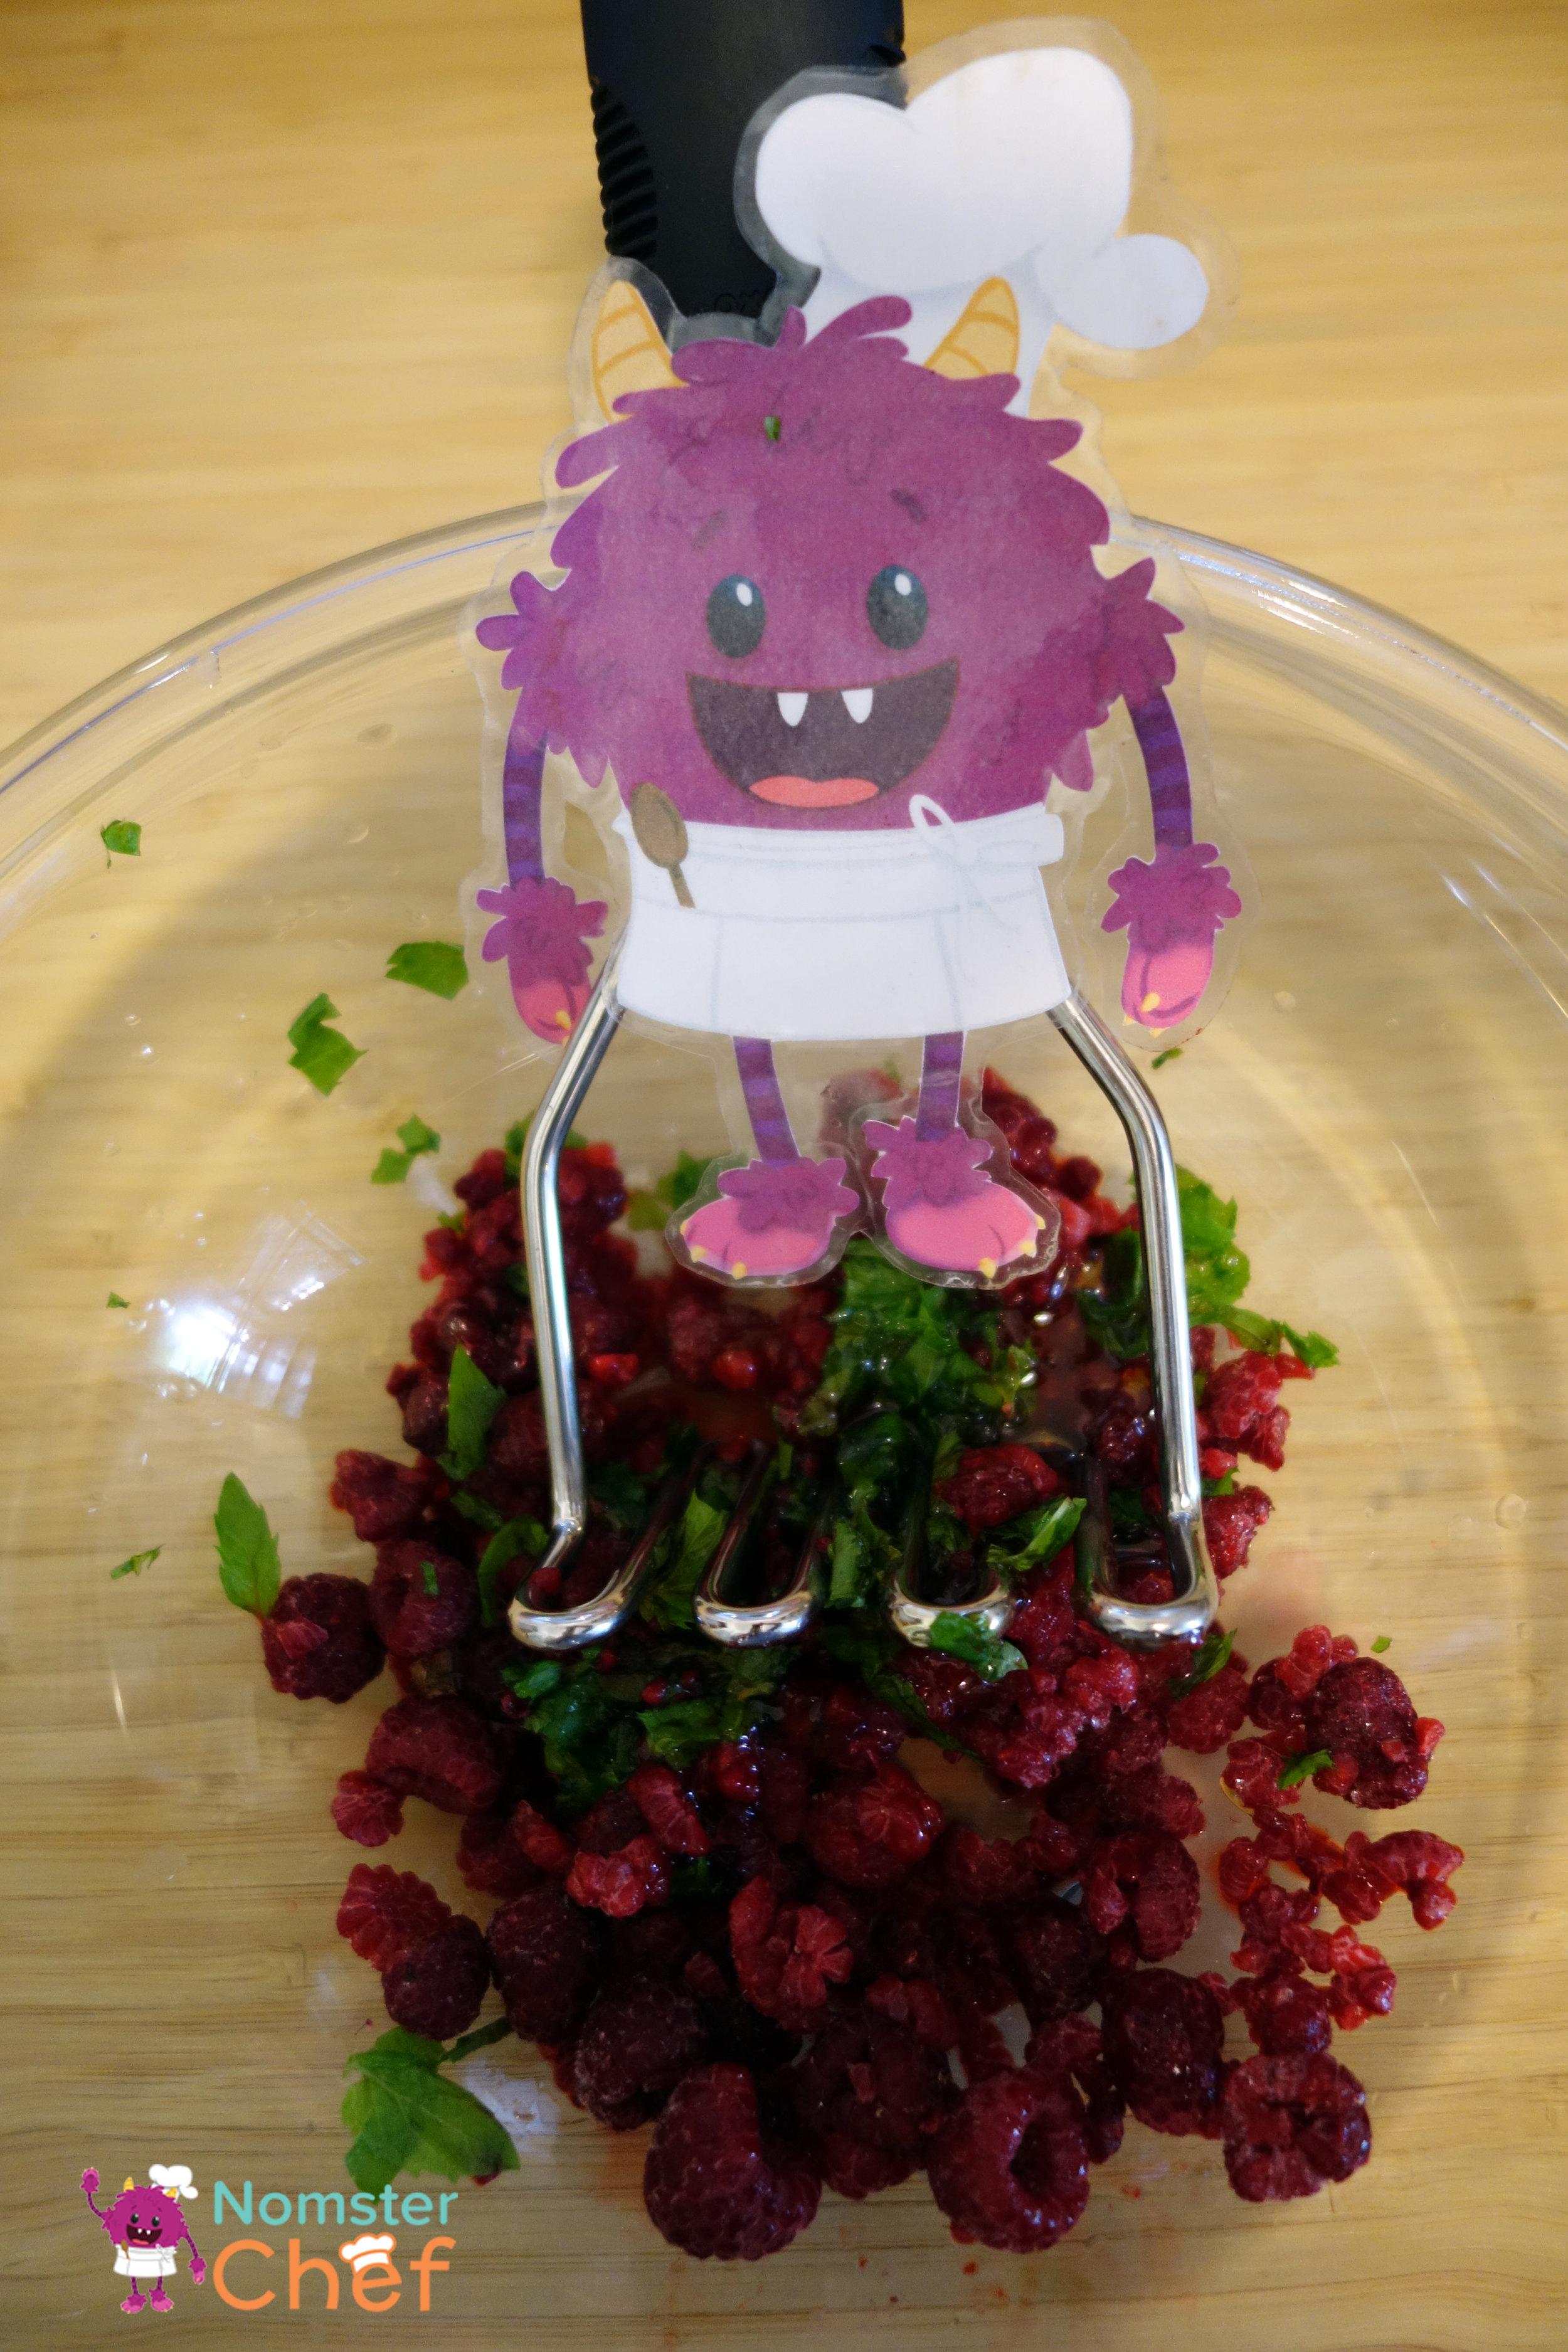 mashing raspberries - raspberry yogurt pop- Nomster Chef